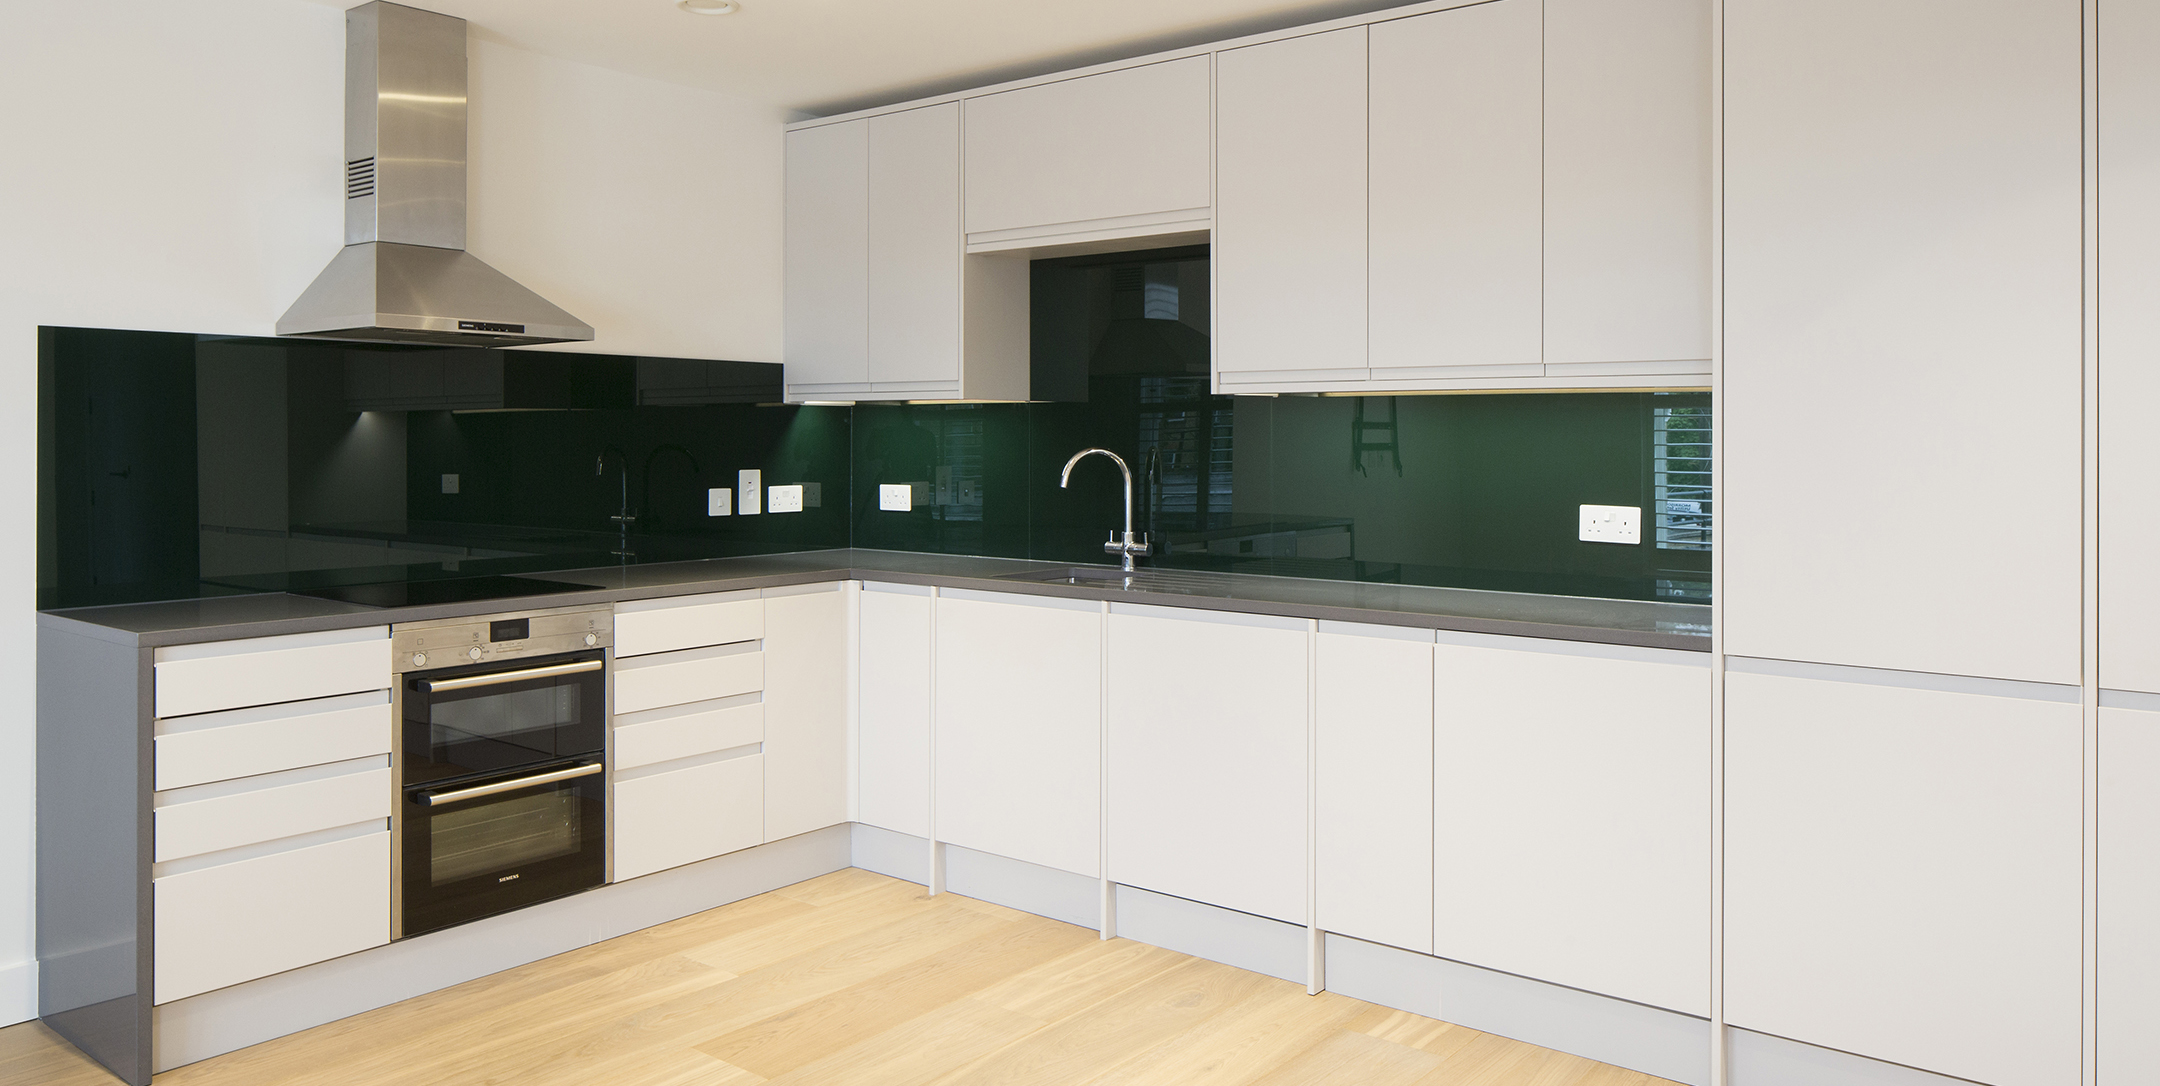 Home Refurbishments Balham SW12 - Ashville Inc